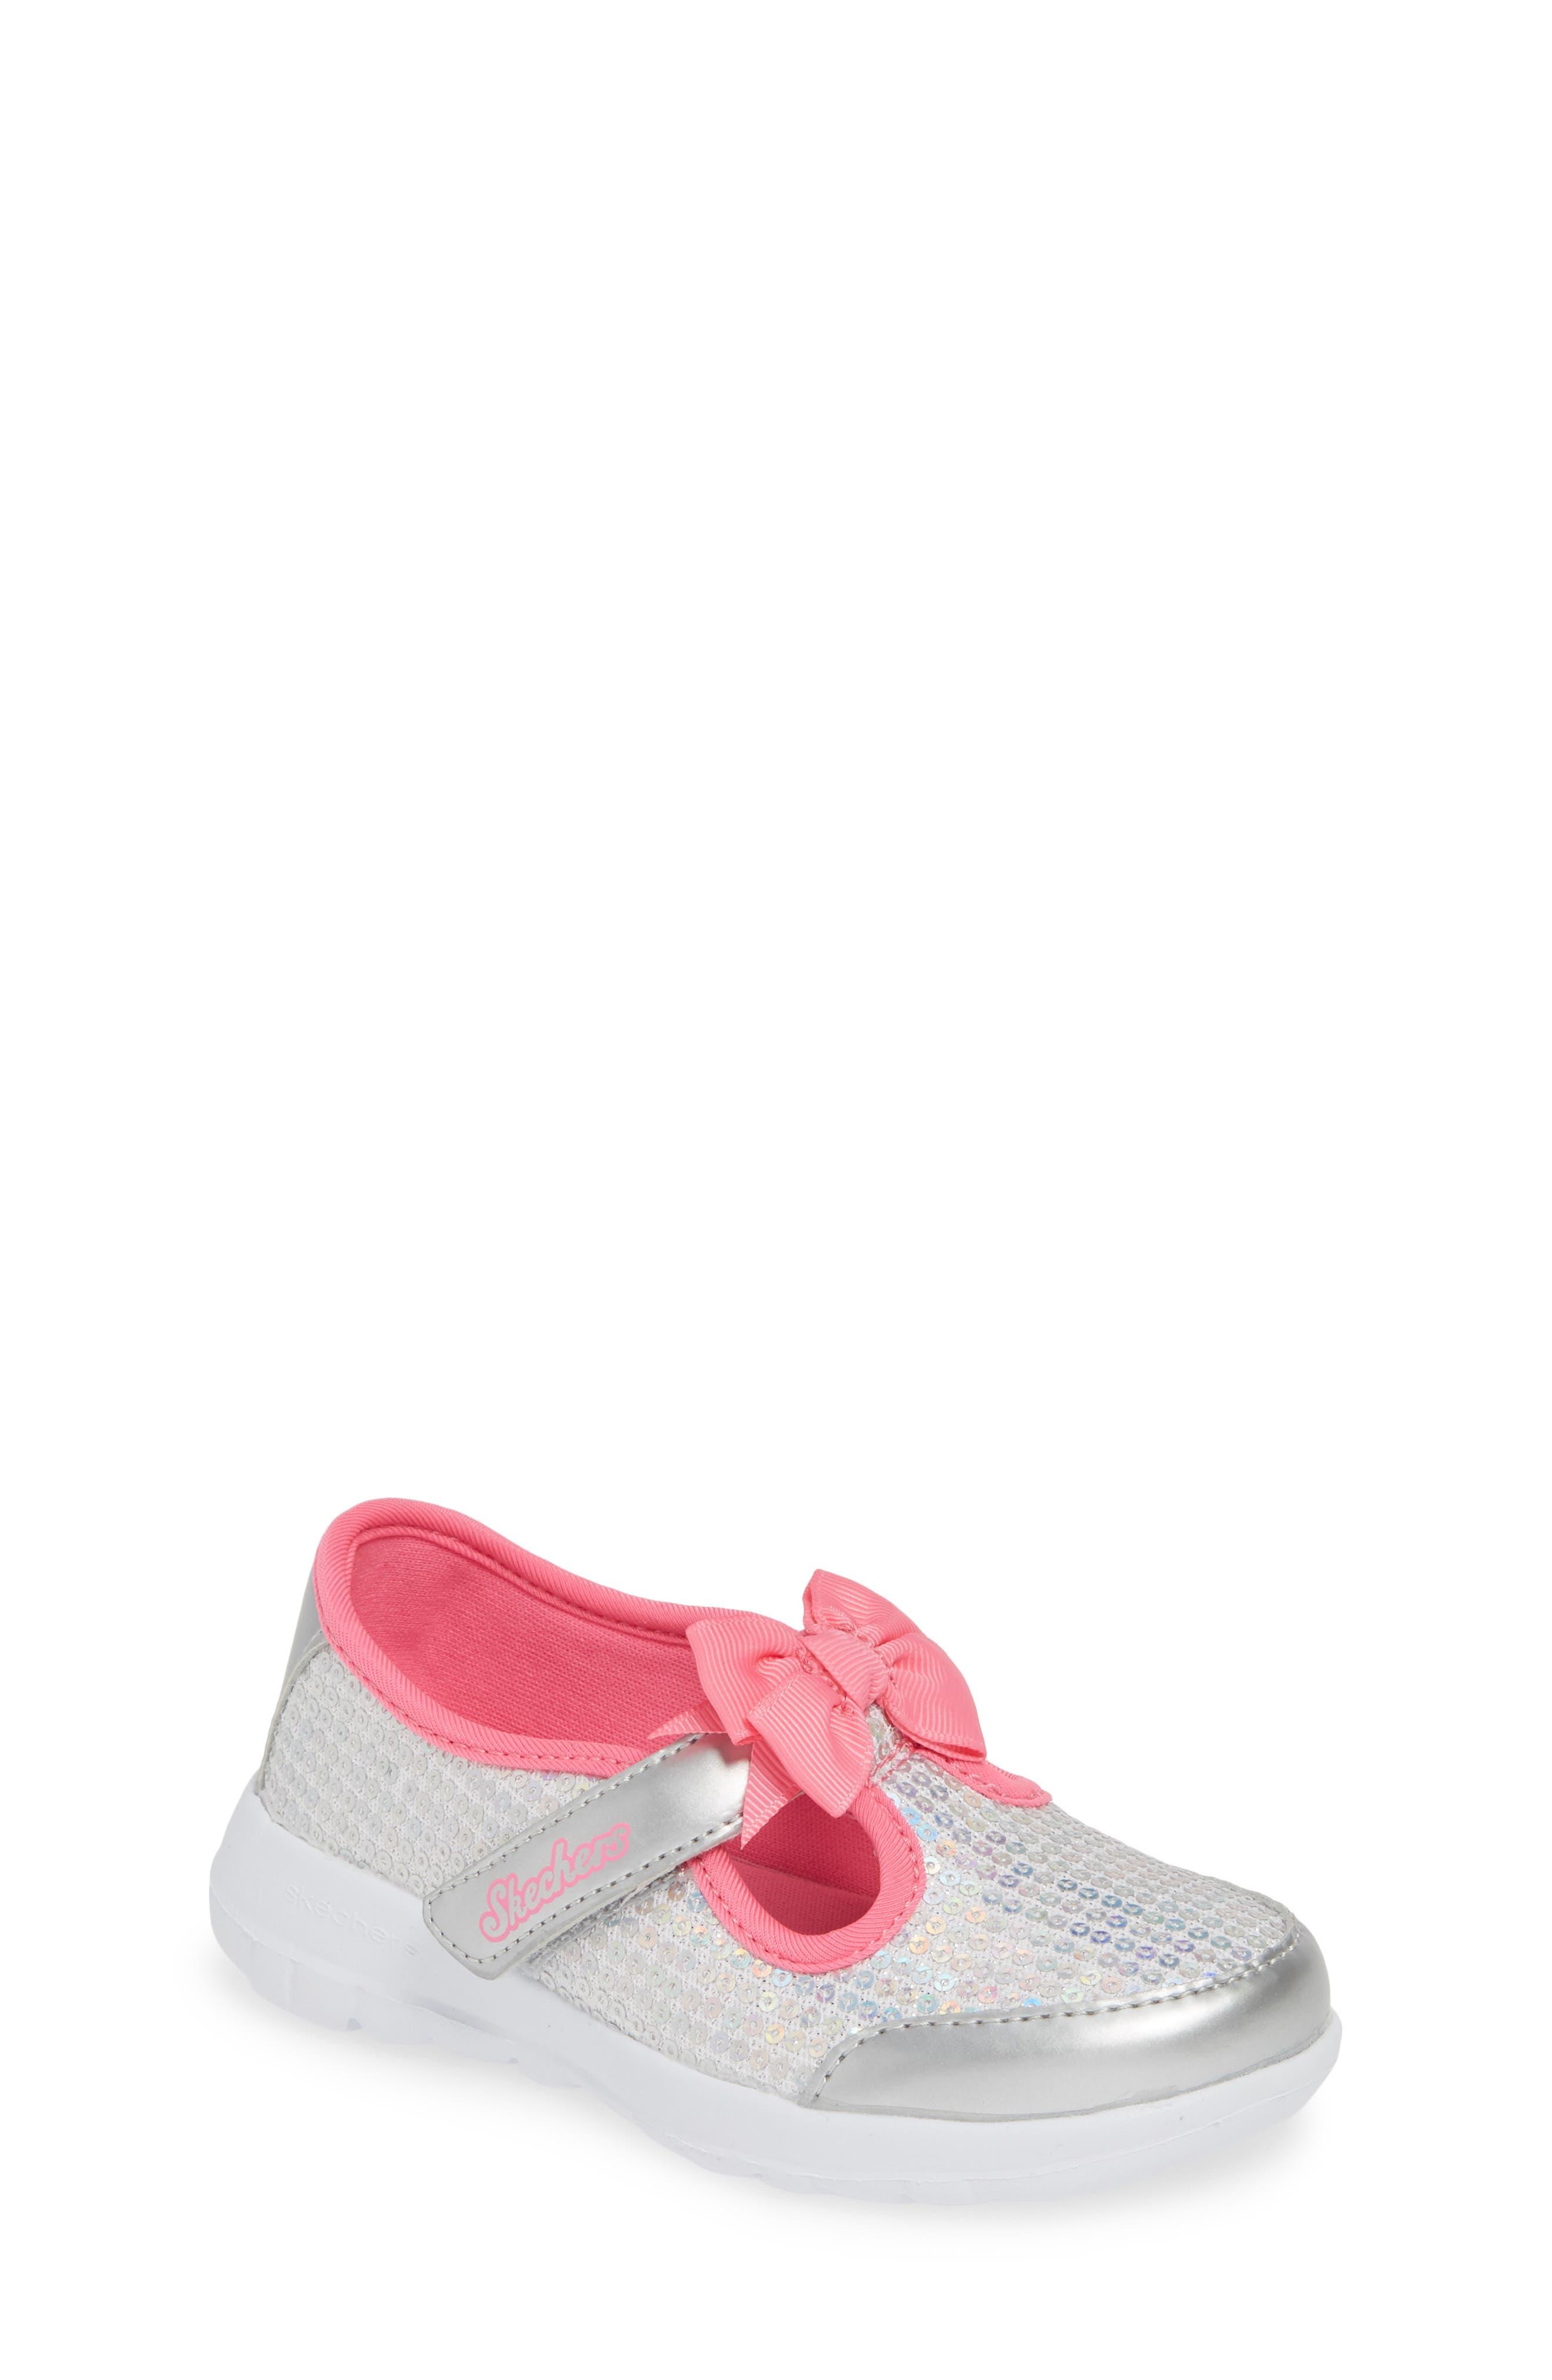 GOwalk Joy Sequin Sneaker, Main, color, SILVER/ MULTI